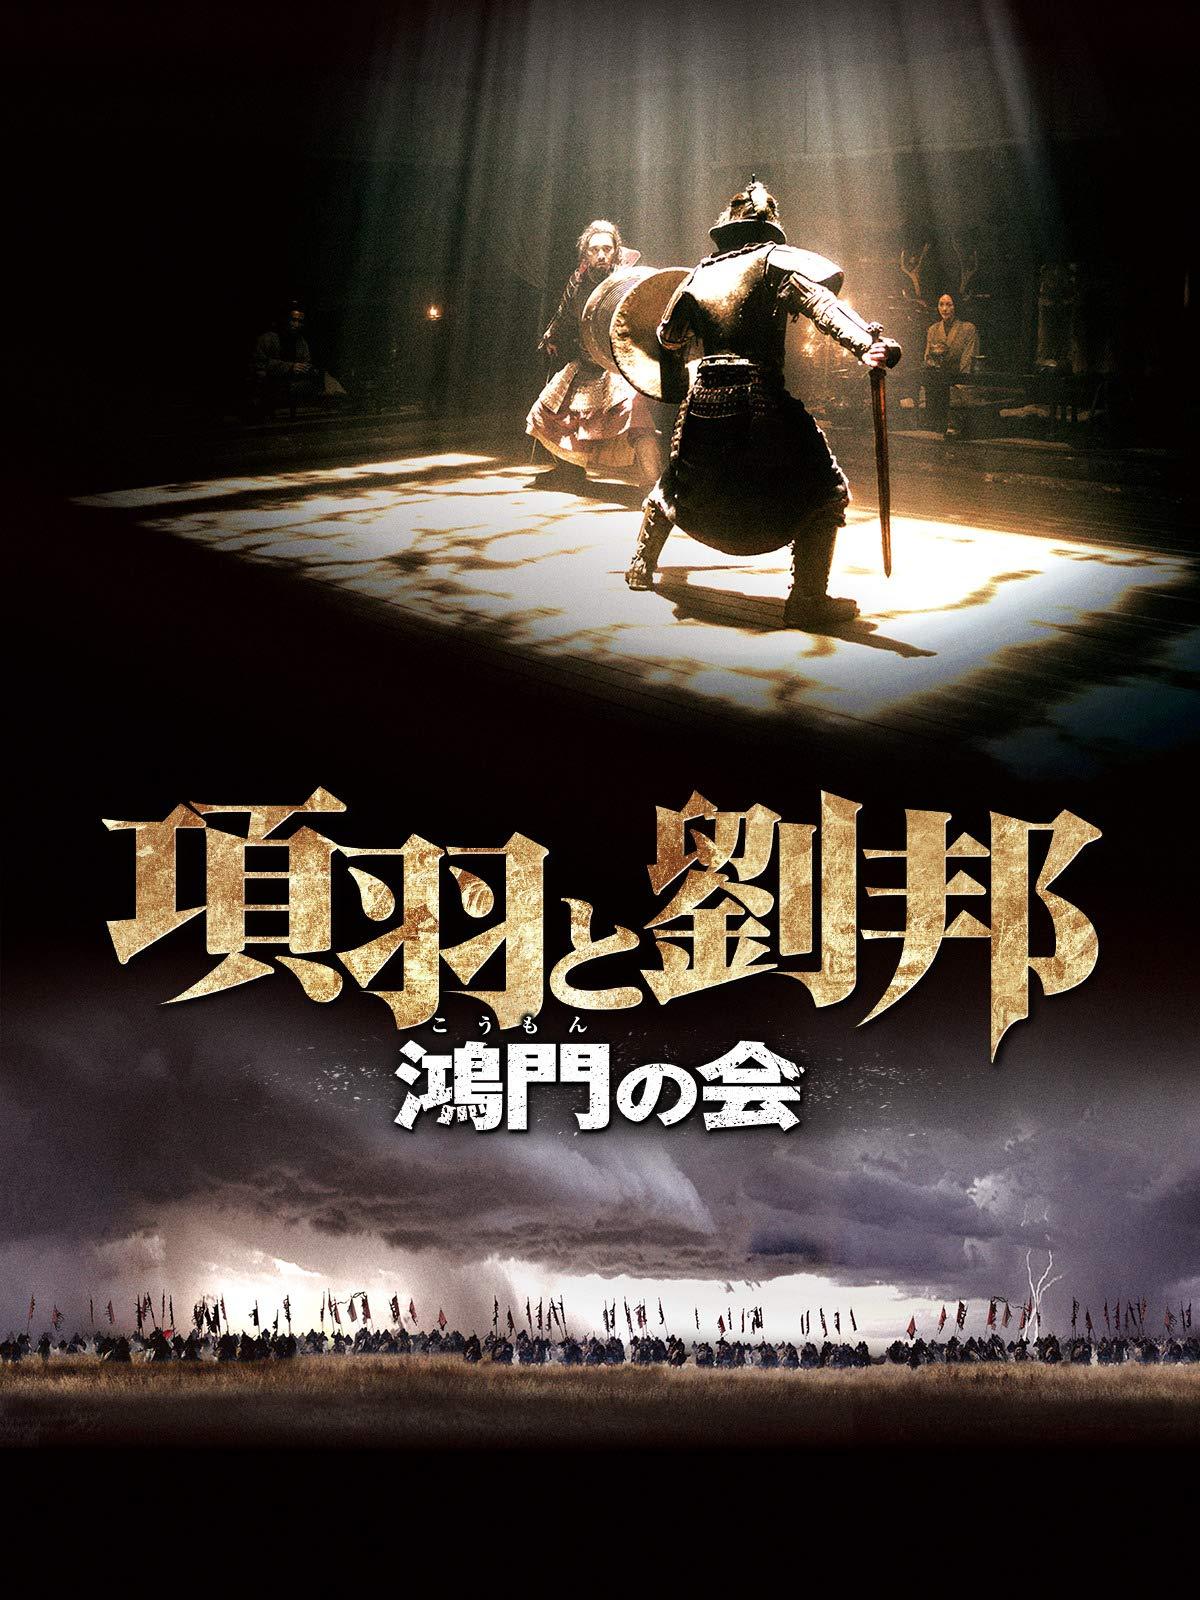 Three of 感想 kingdoms secret 三国志